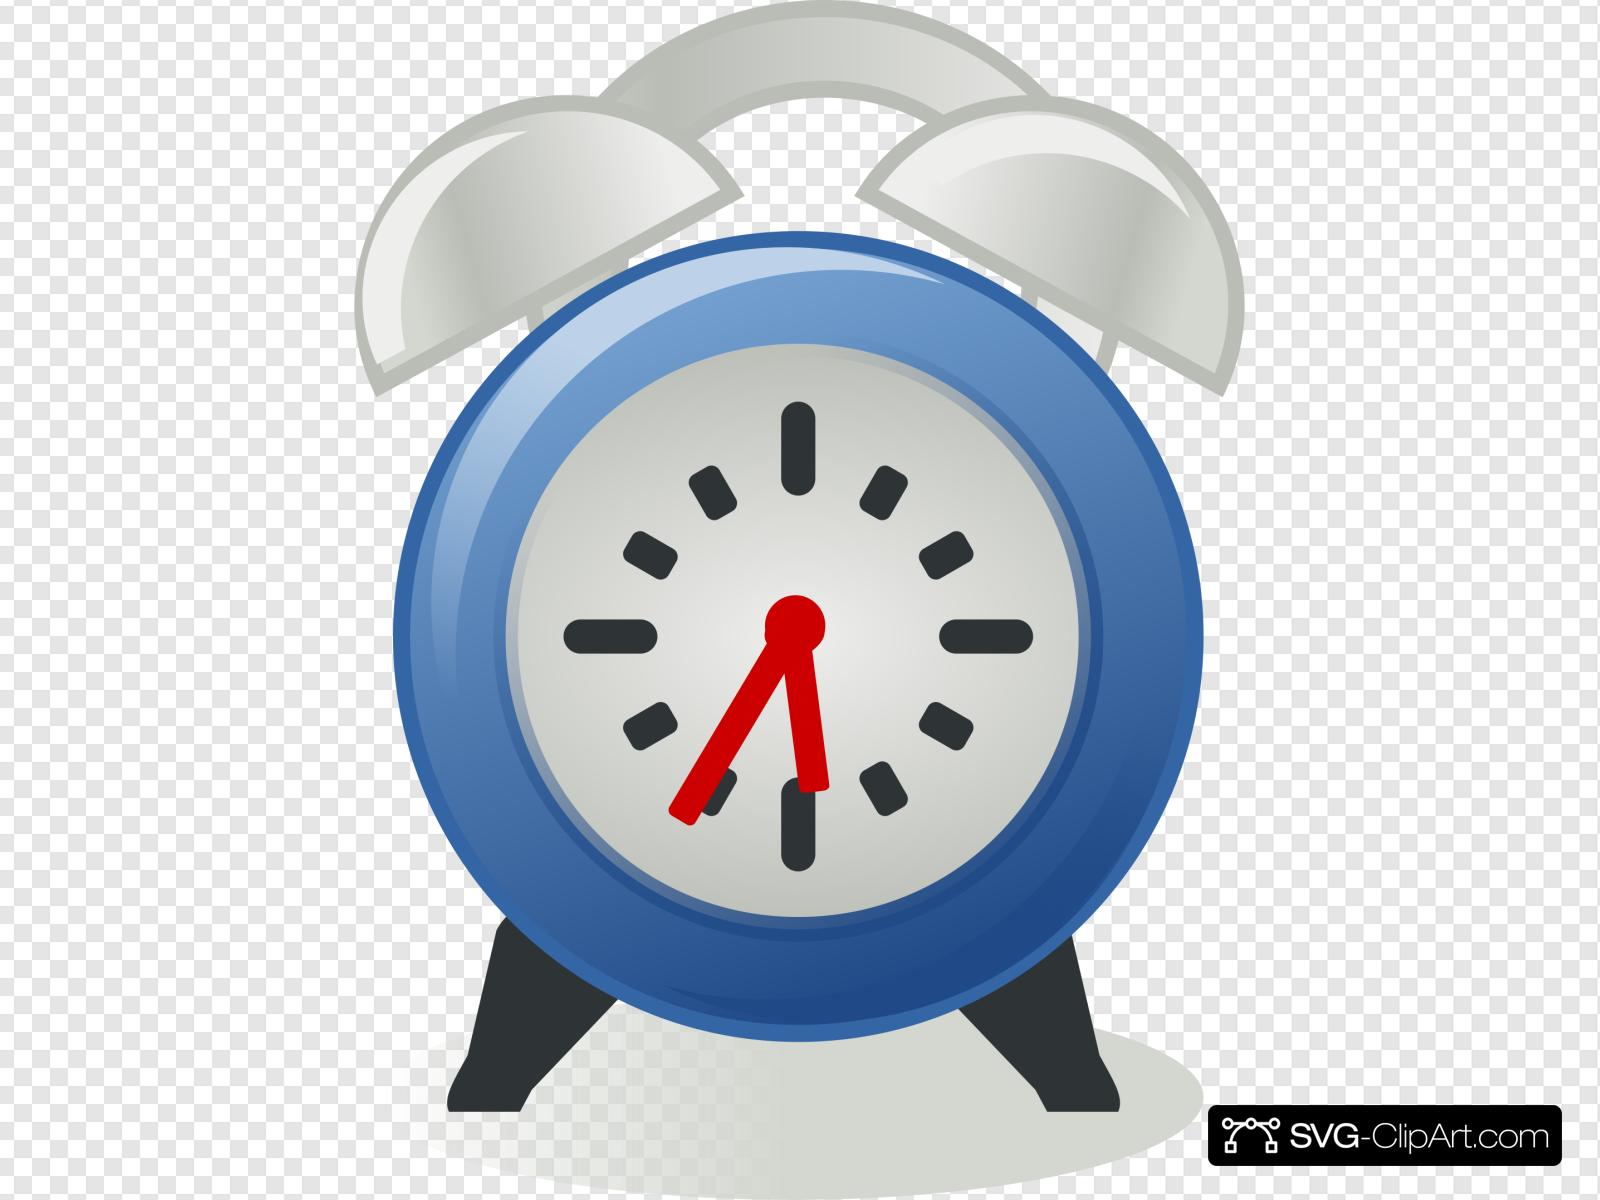 Alarm clock clipart blue banner free stock Alarm Clock Clip art, Icon and SVG - SVG Clipart banner free stock